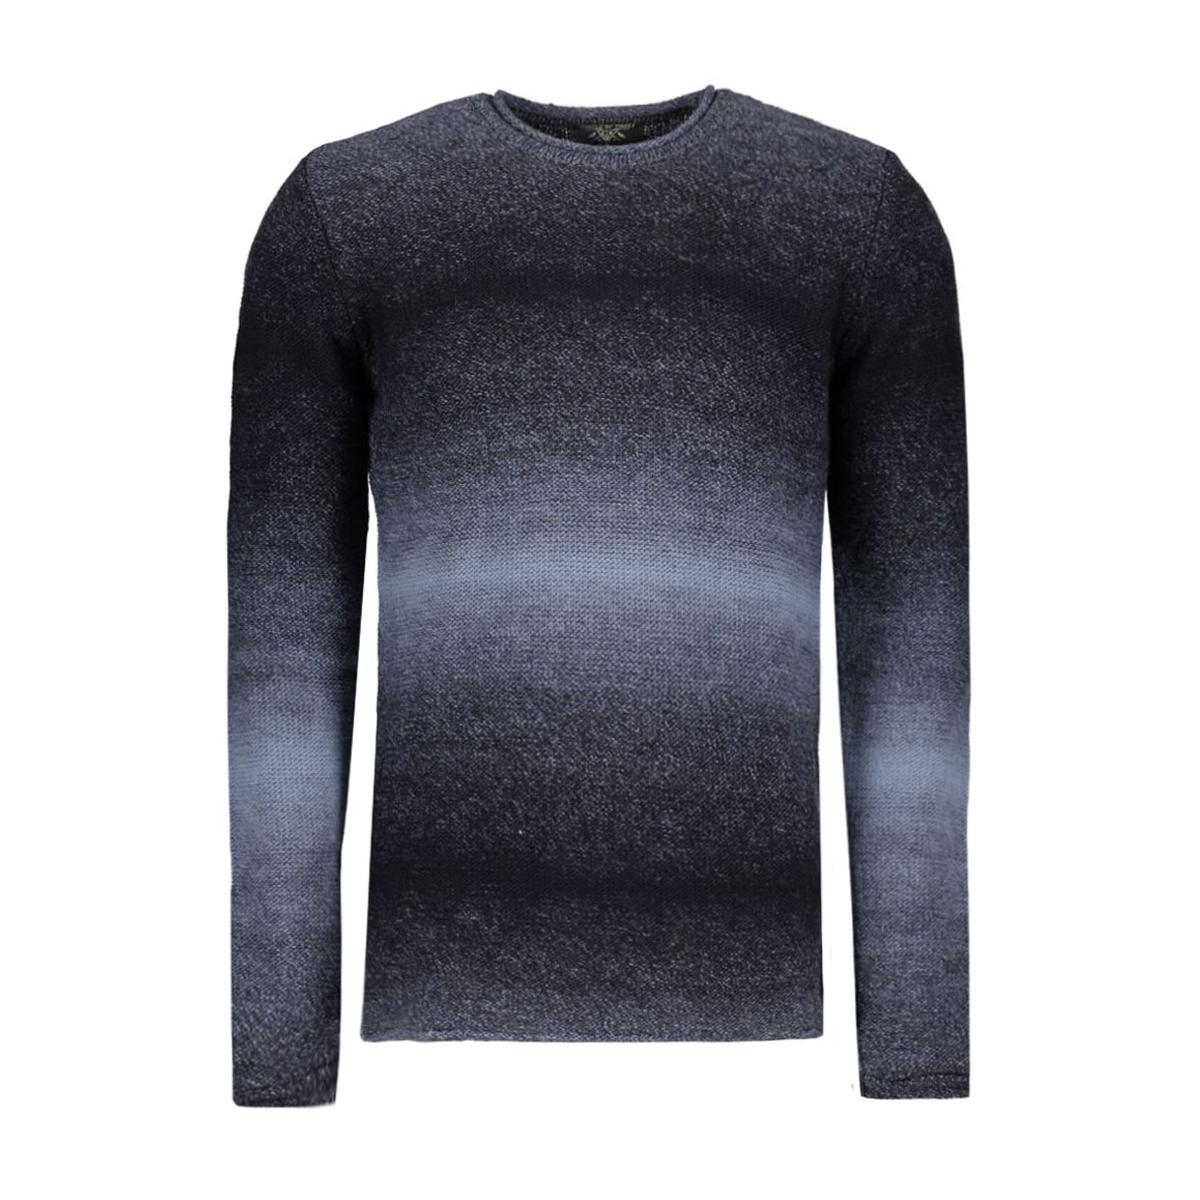 hw16.46.1955 dwayne knit garcia trui arctic wave